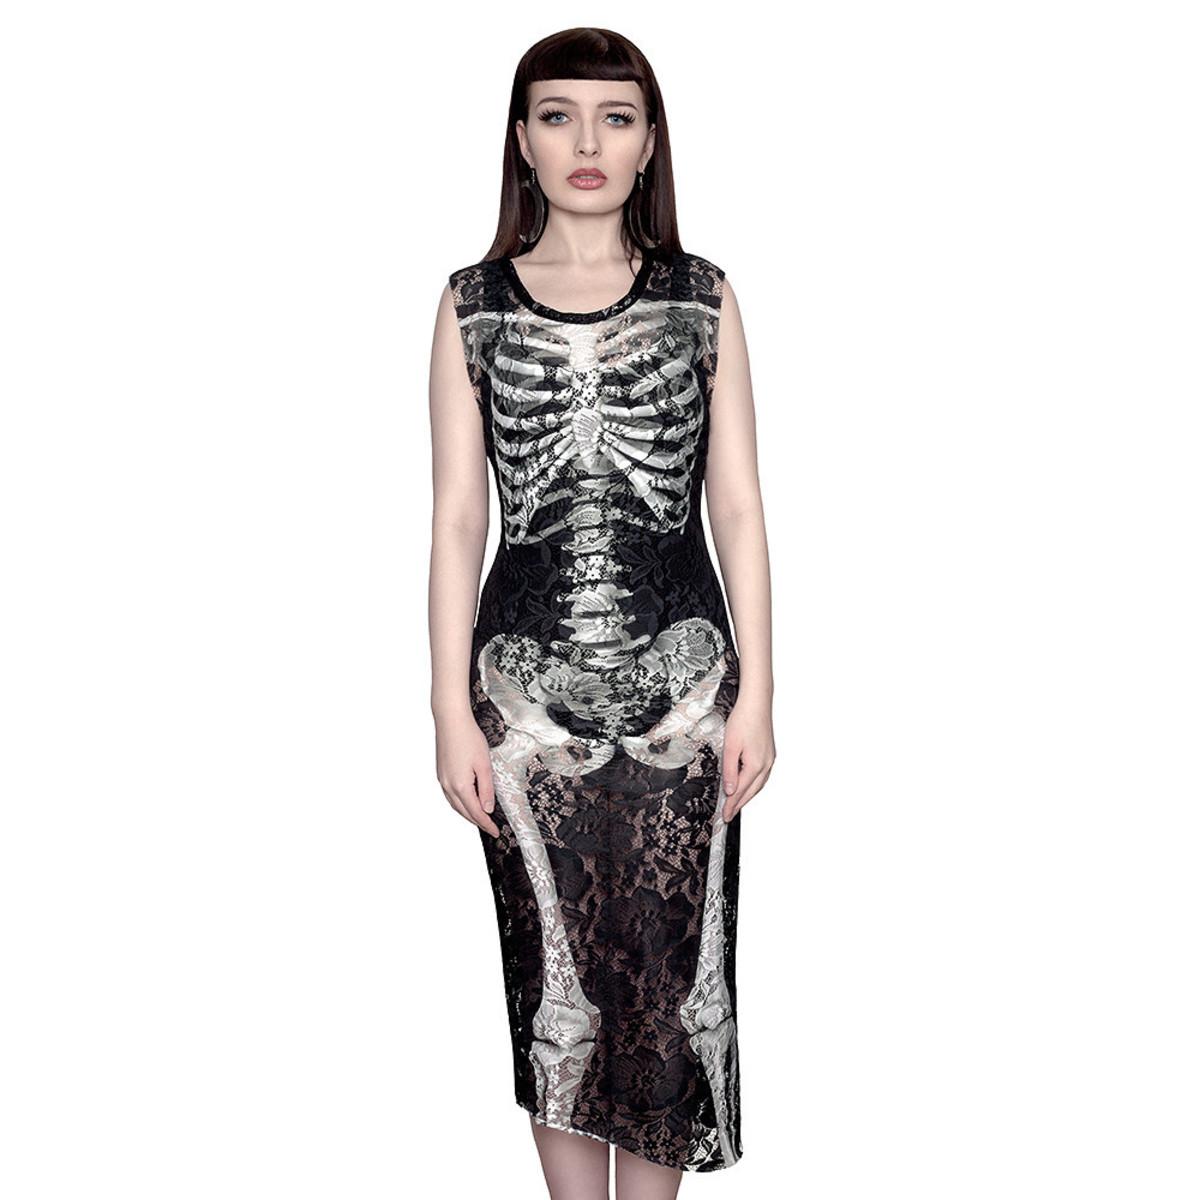 šaty dámské KILLSTAR - Skeletor Lace Maxi - Black S